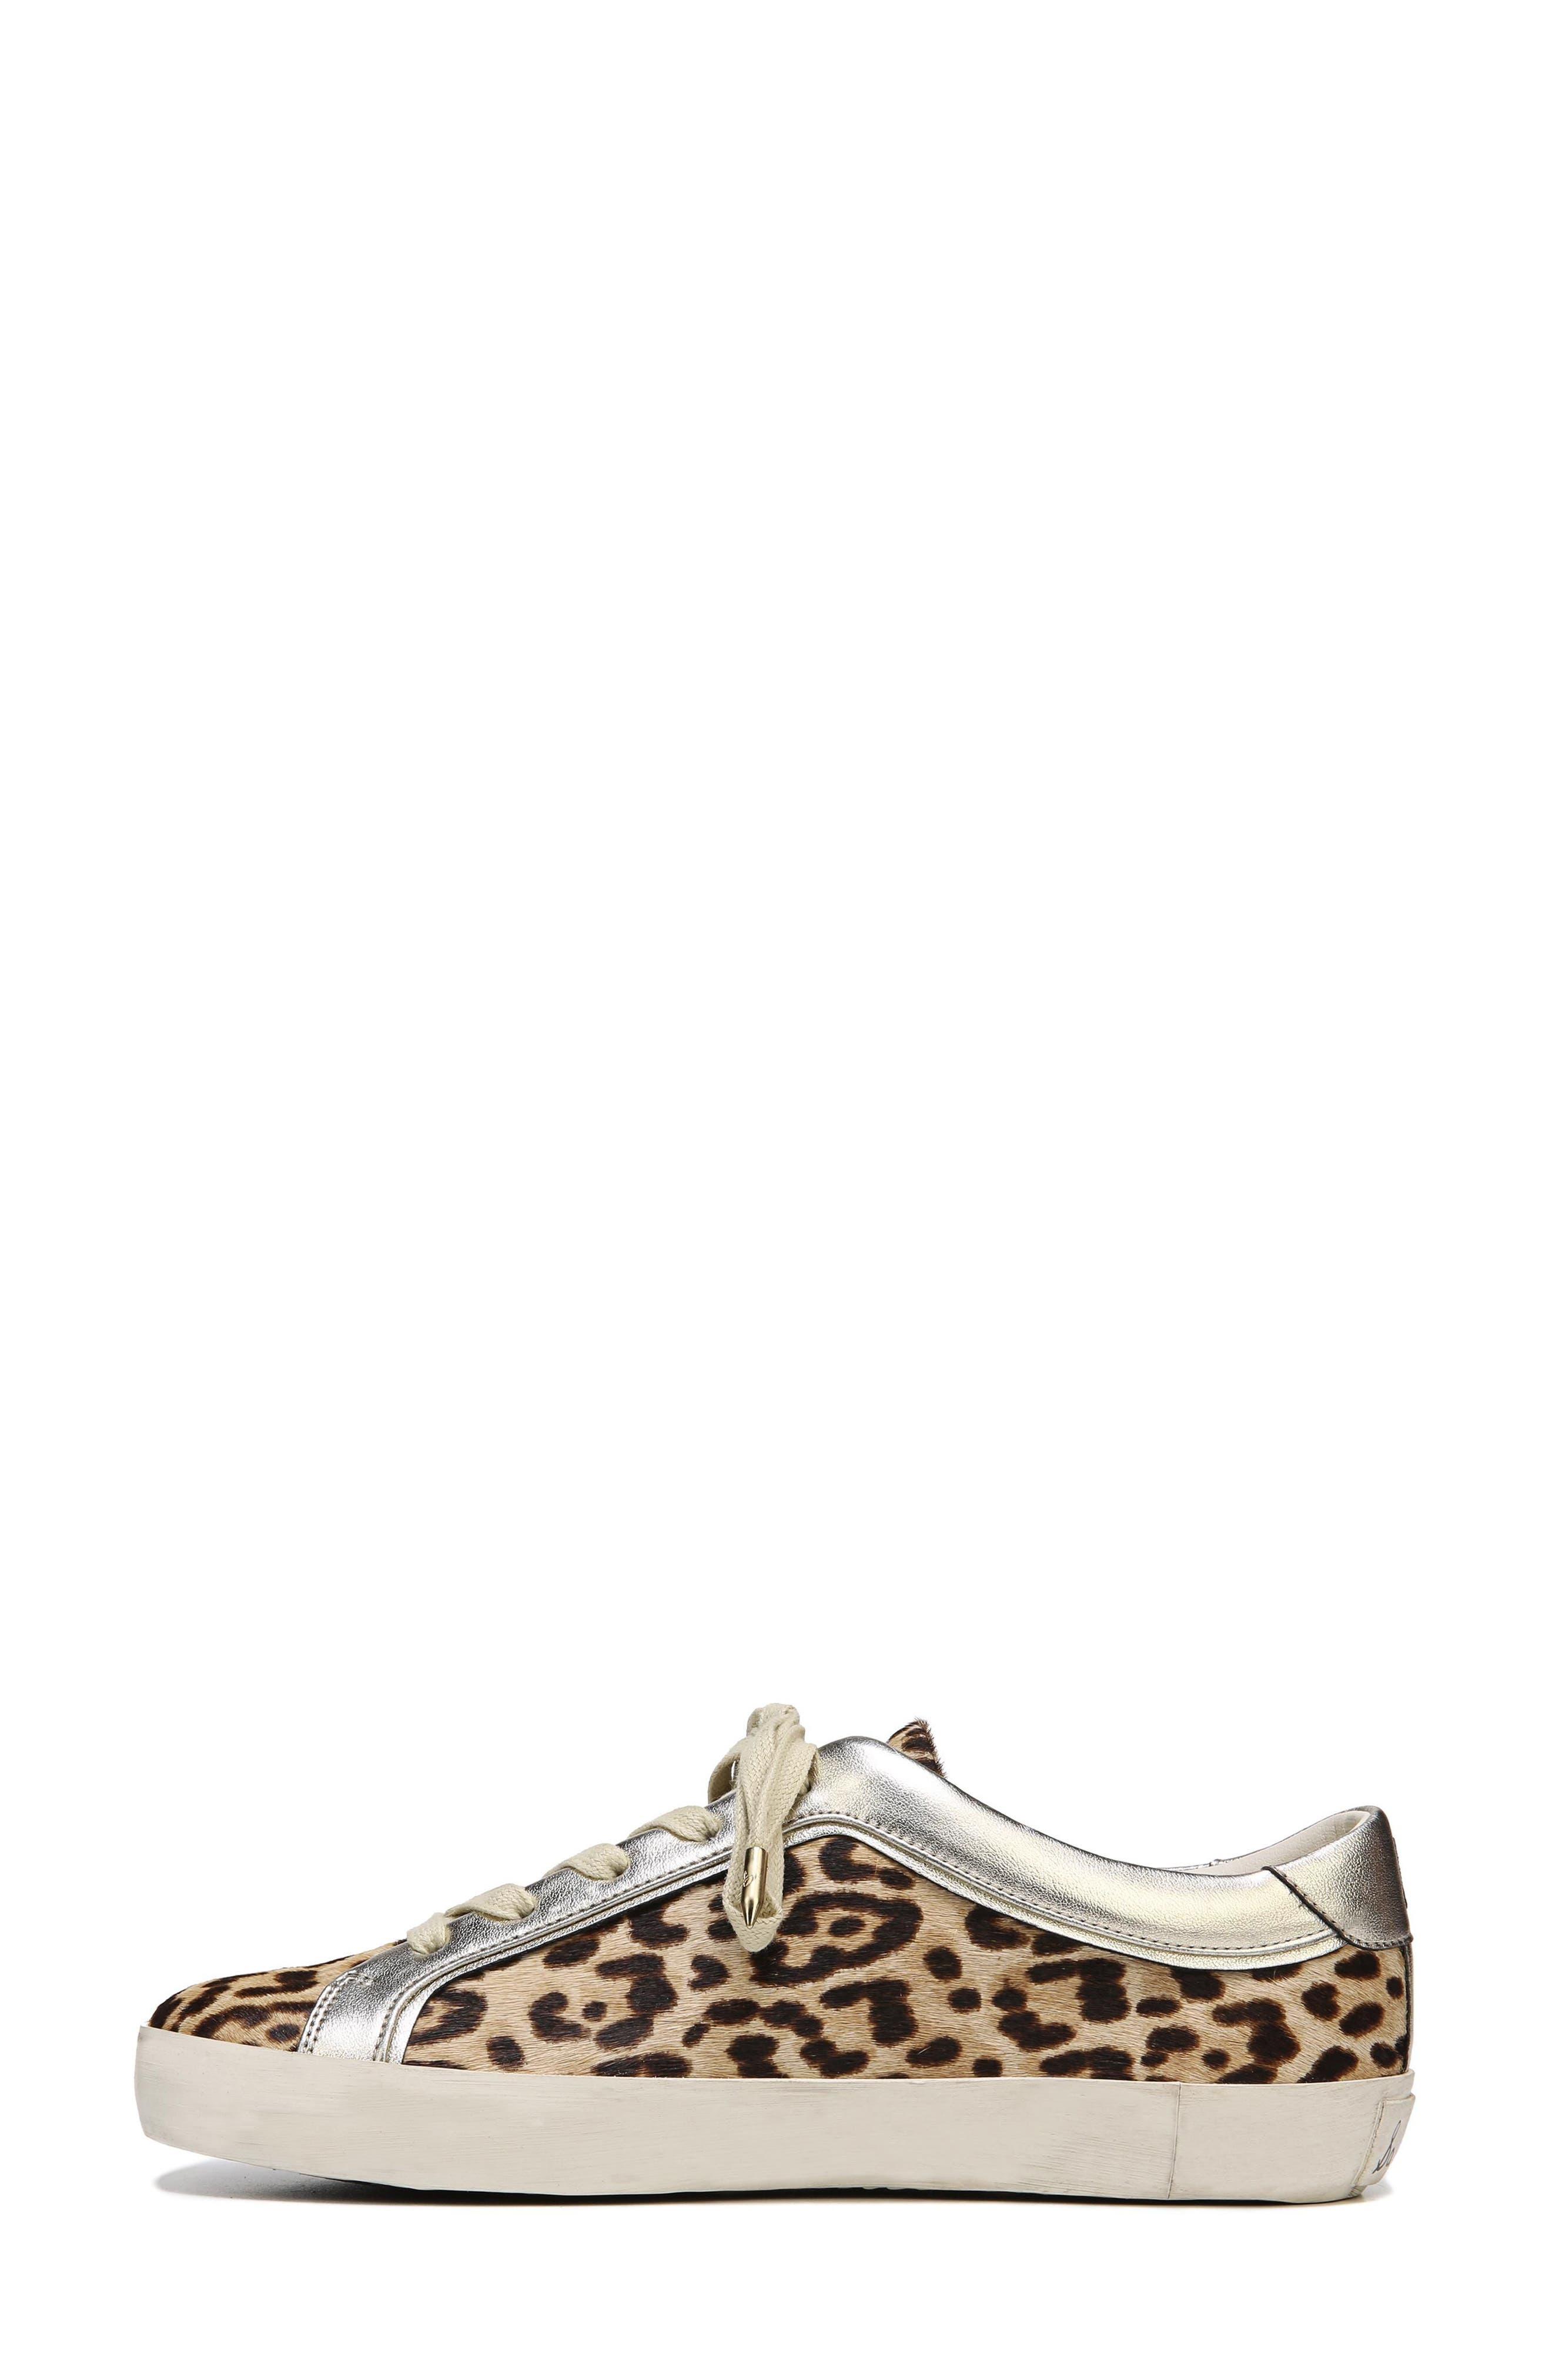 Britton 2 Sneaker,                             Alternate thumbnail 4, color,                             Leopard Brahma Hair